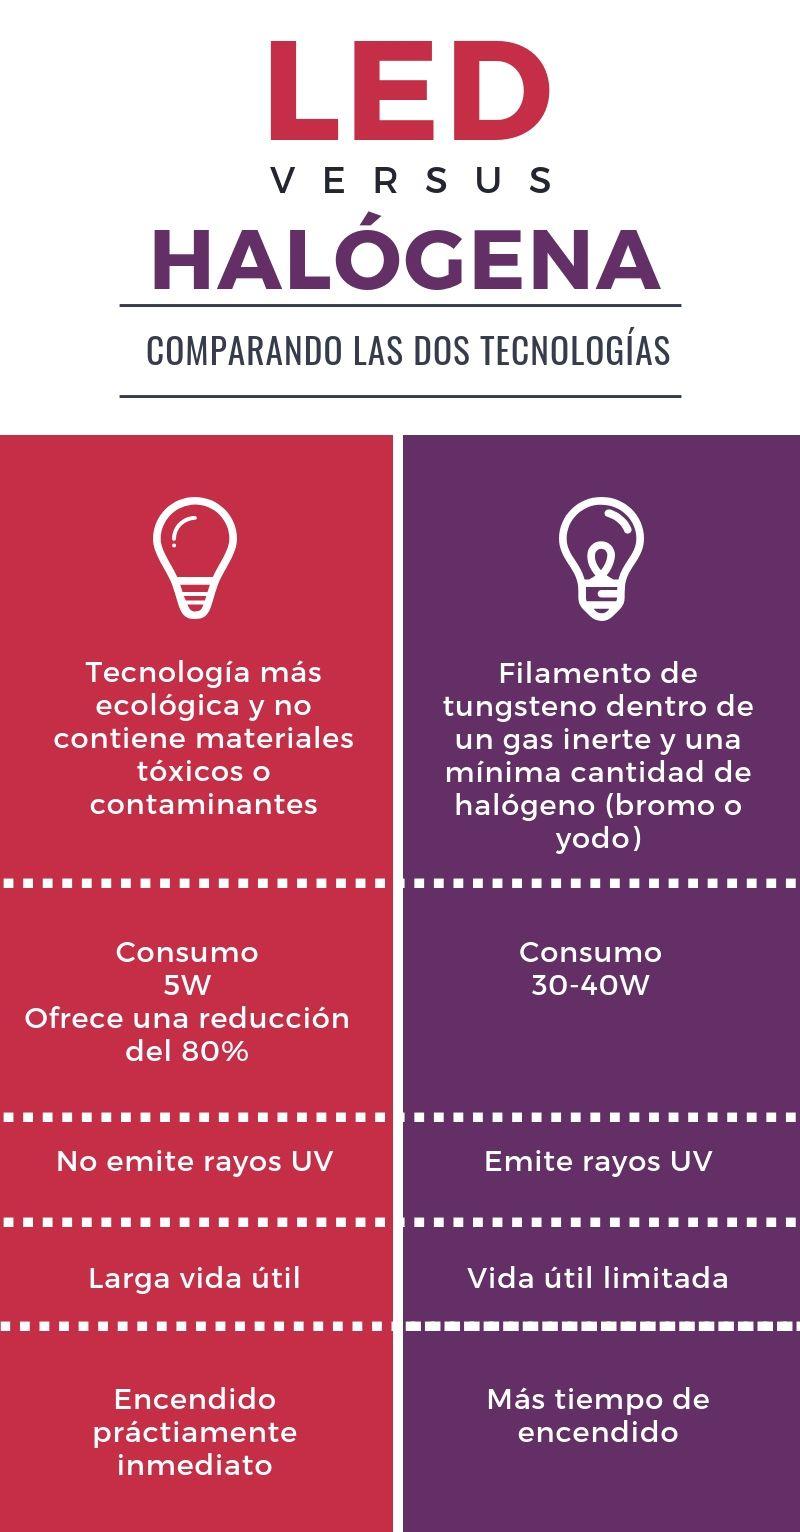 el led versus halogena electrocatproject